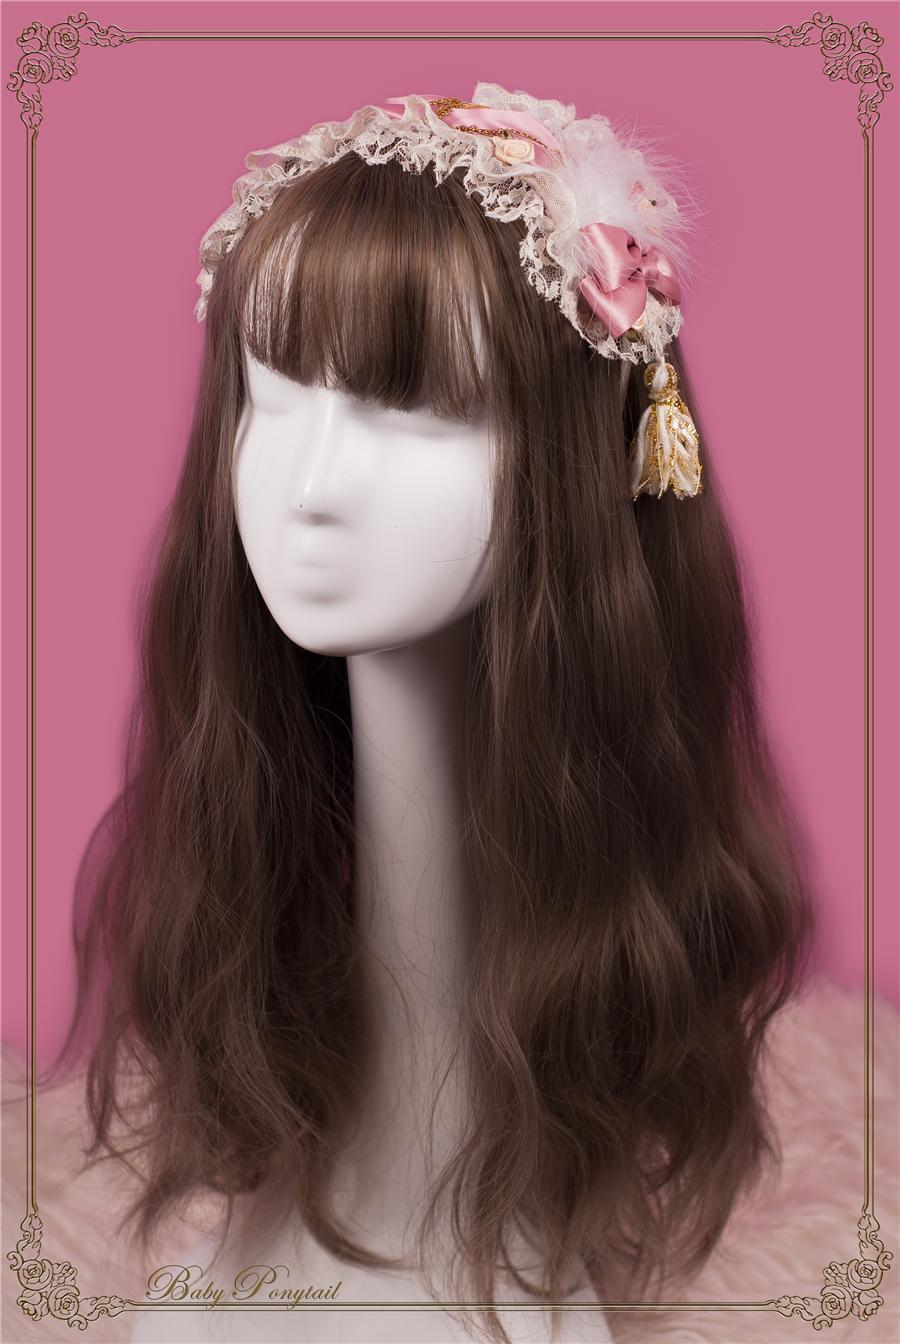 Babyponytail_Accessory_Tassel Head Dress_0.jpg